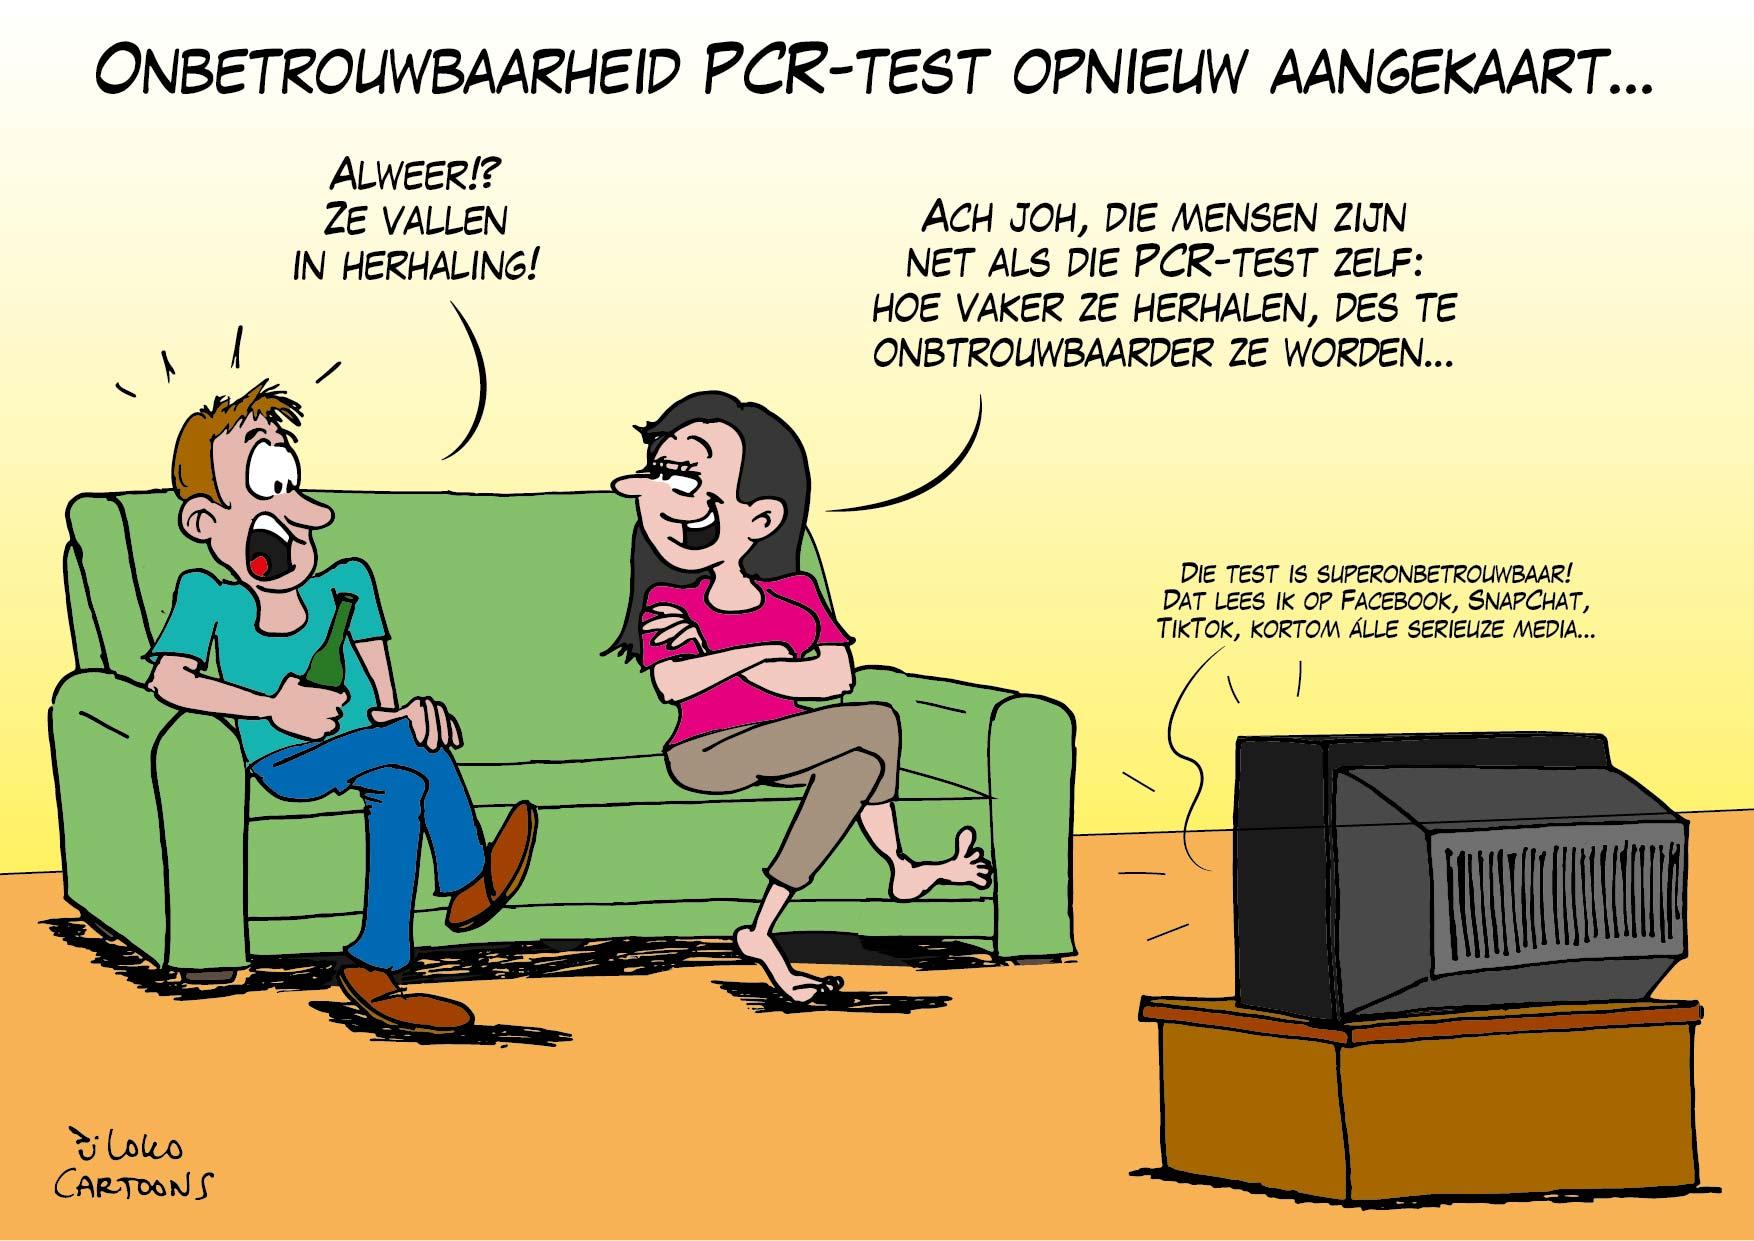 Onbetrouwbaarheid PCR-test opnieuw aangekaart…